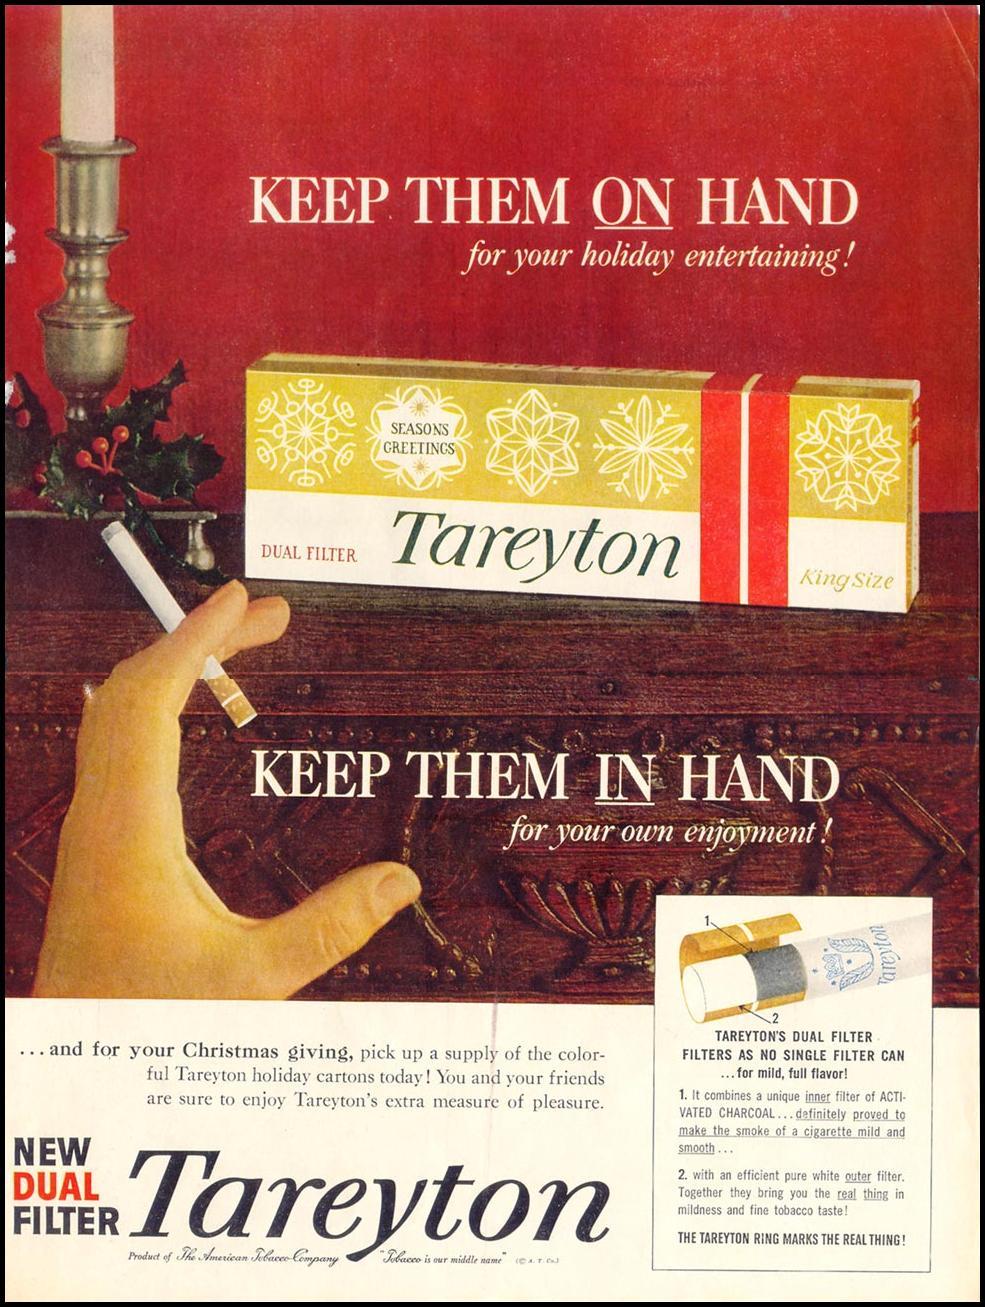 TAREYTON CIGARETTES LIFE 12/14/1959 p. 67